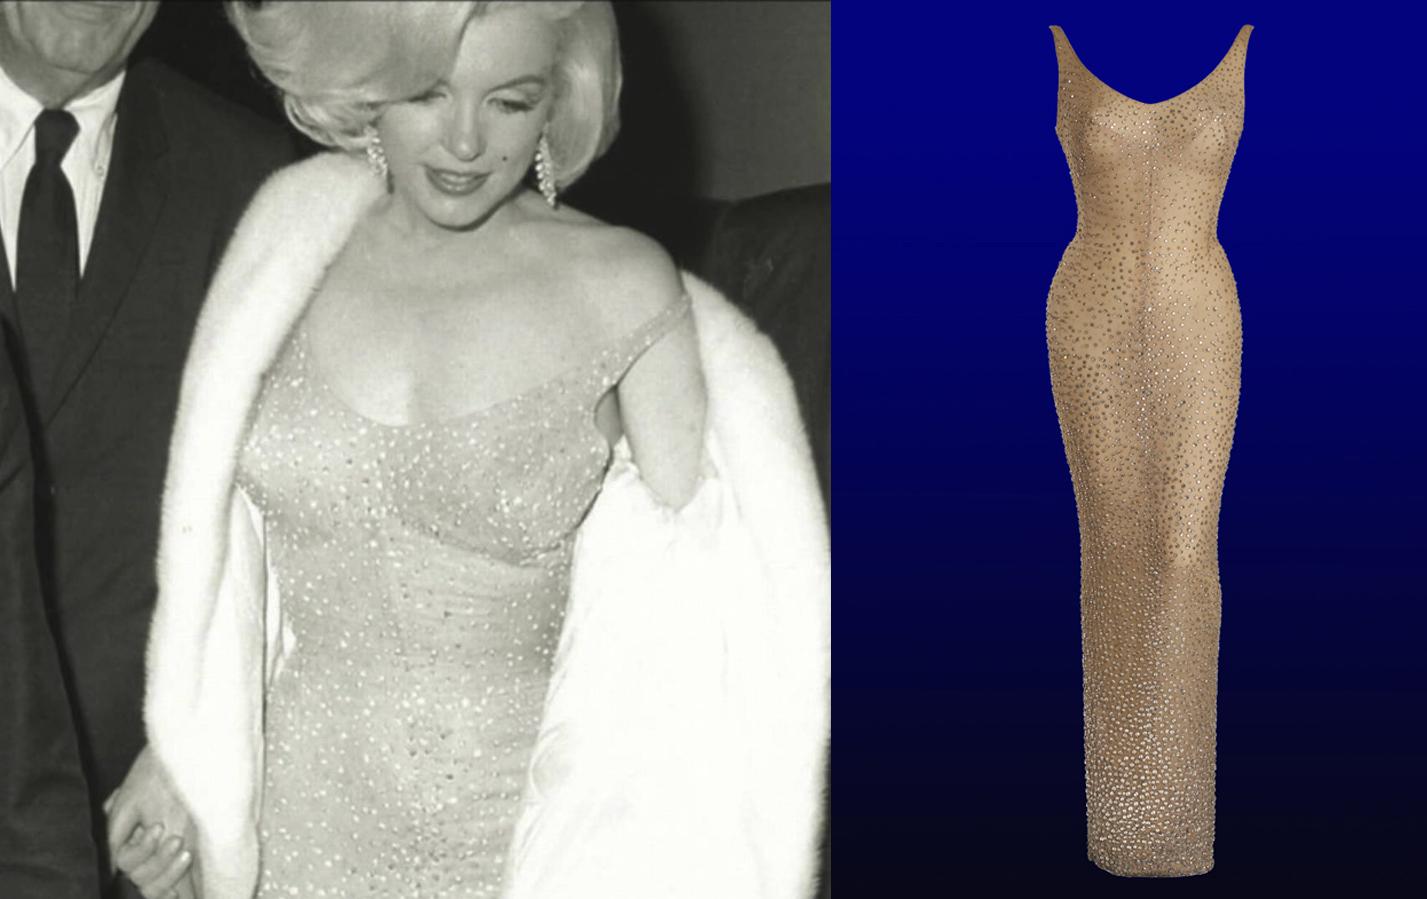 Marilyn Monroes Happy Birthday, Mr. President dress